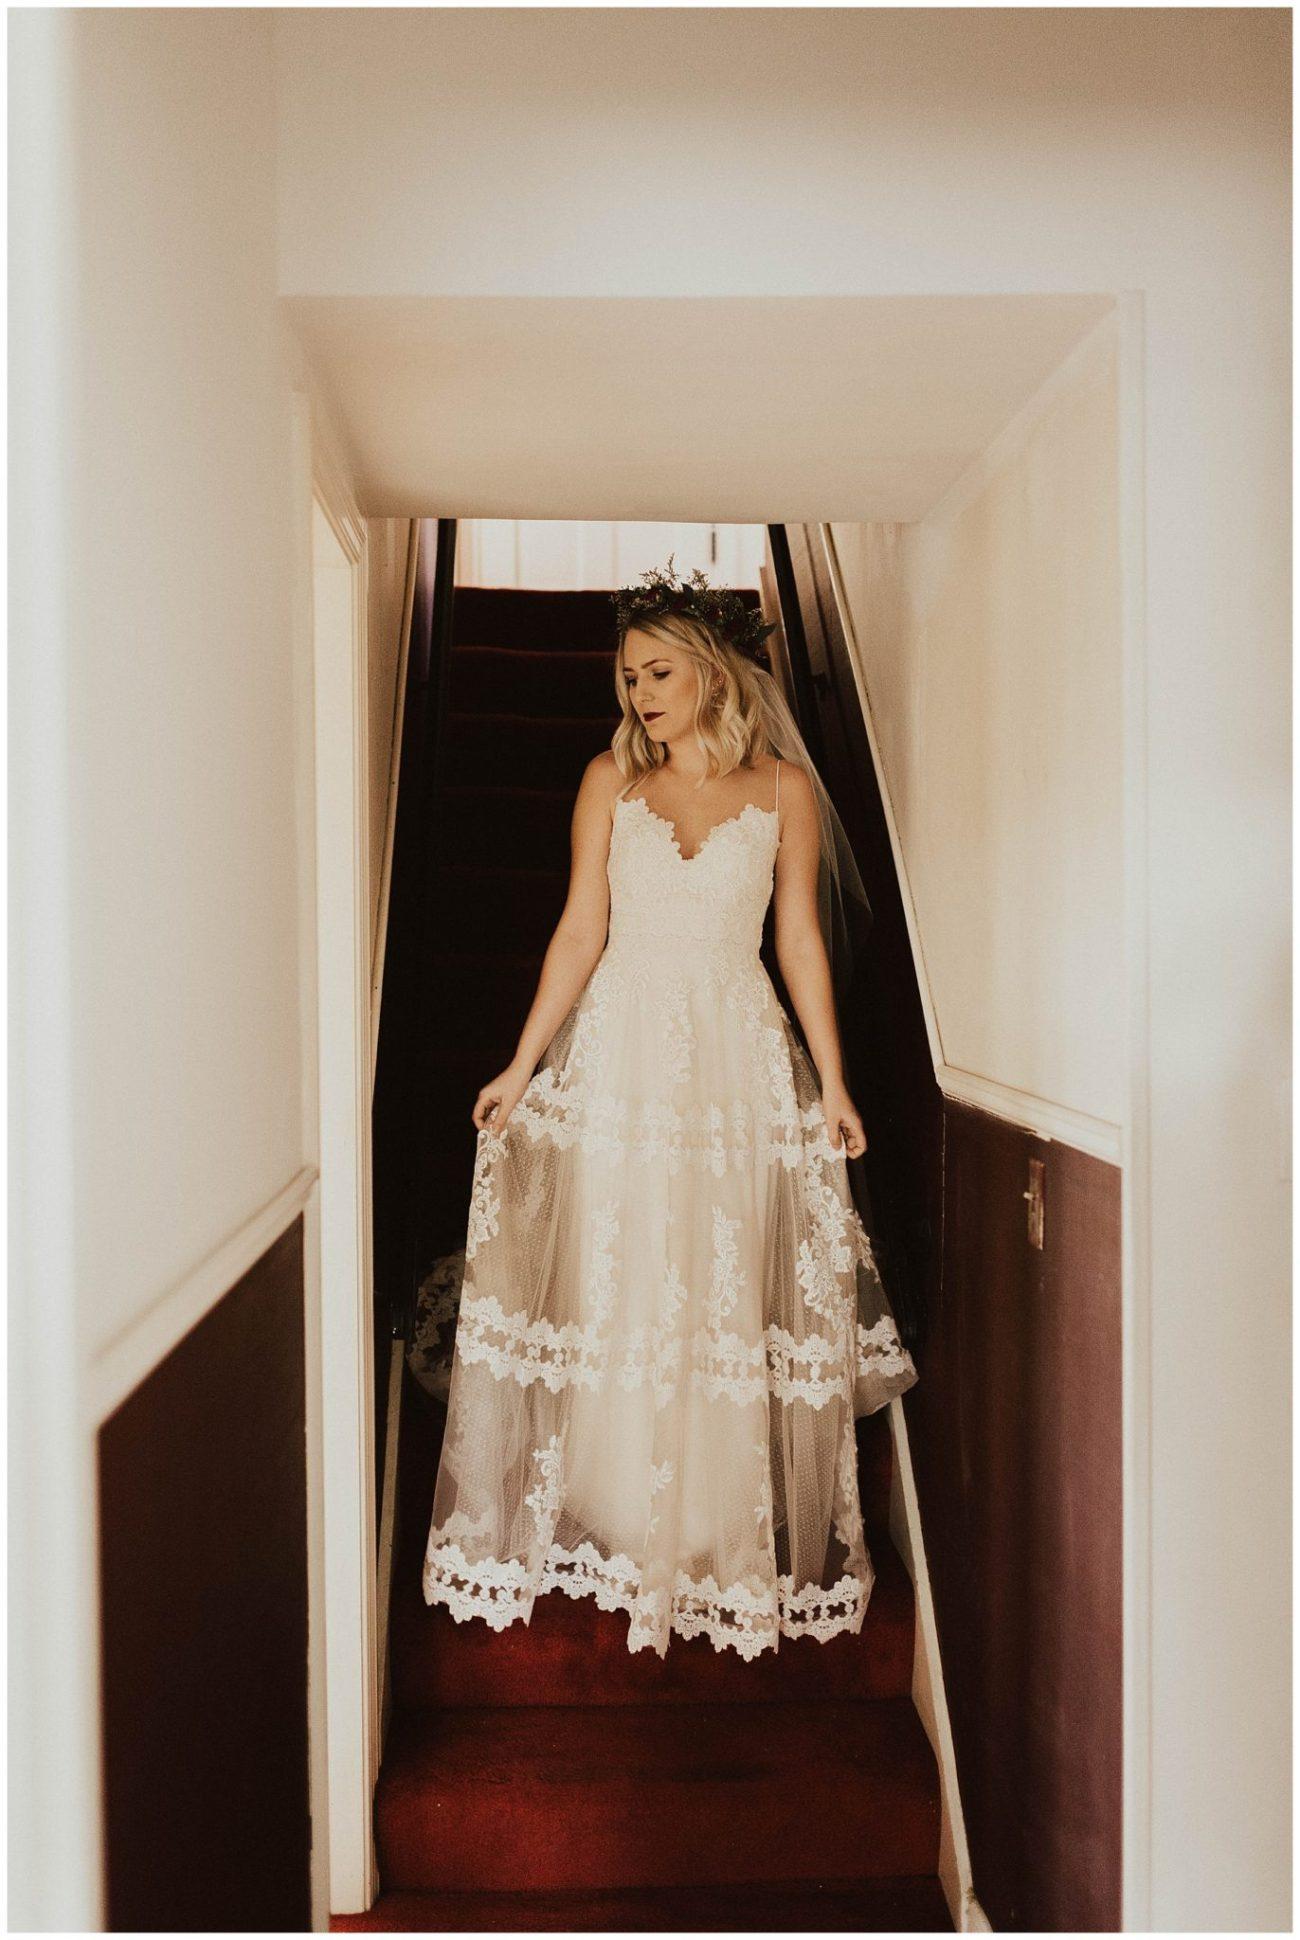 17289ad1cbf Hannah + Brian // Christmas Cabin Wedding - Lauren F.otography ...